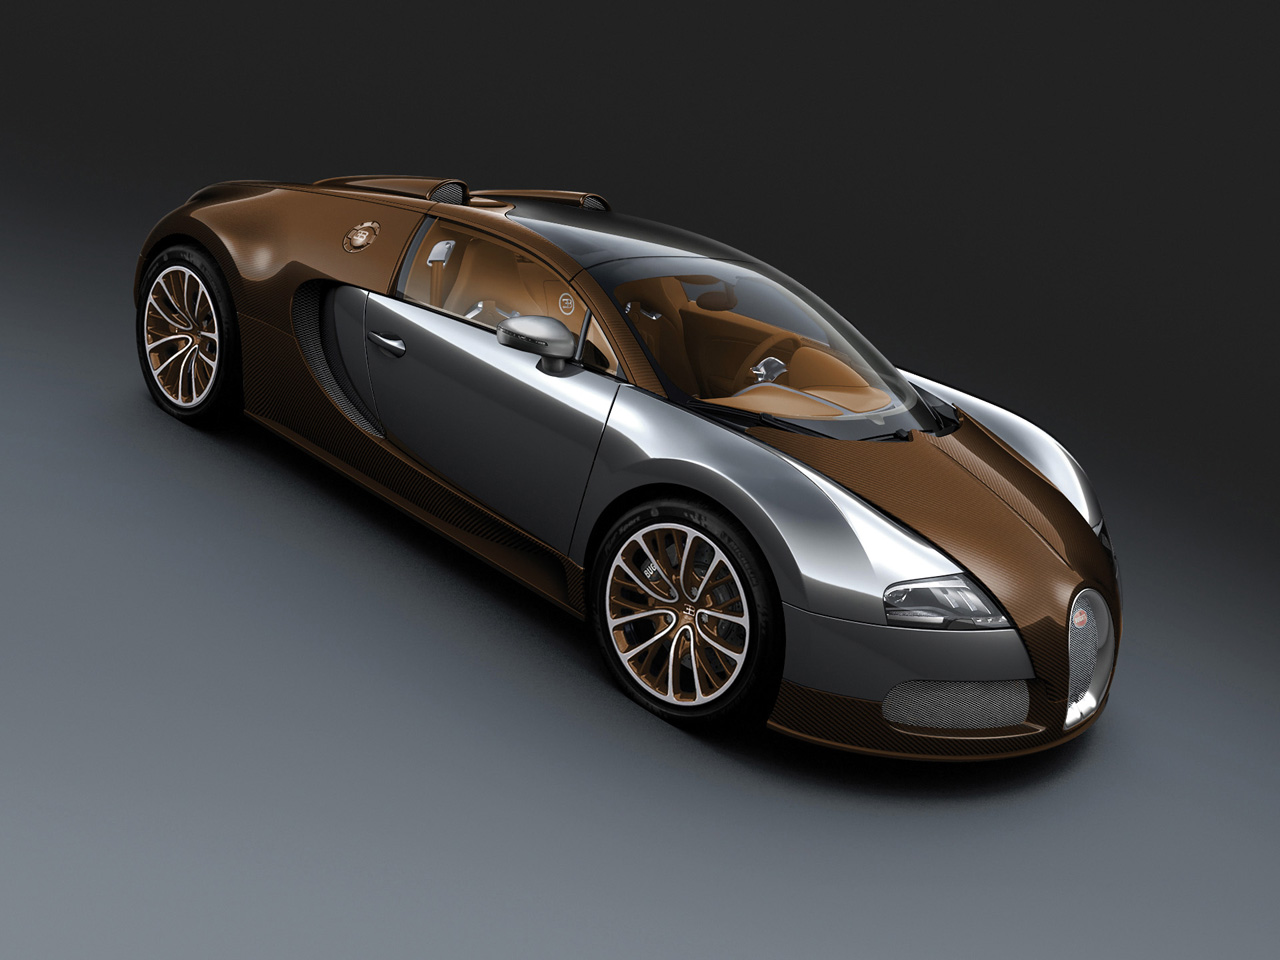 5 bugatti veyron 16 4 grand sport vitesse let 39 s make a baby. Black Bedroom Furniture Sets. Home Design Ideas